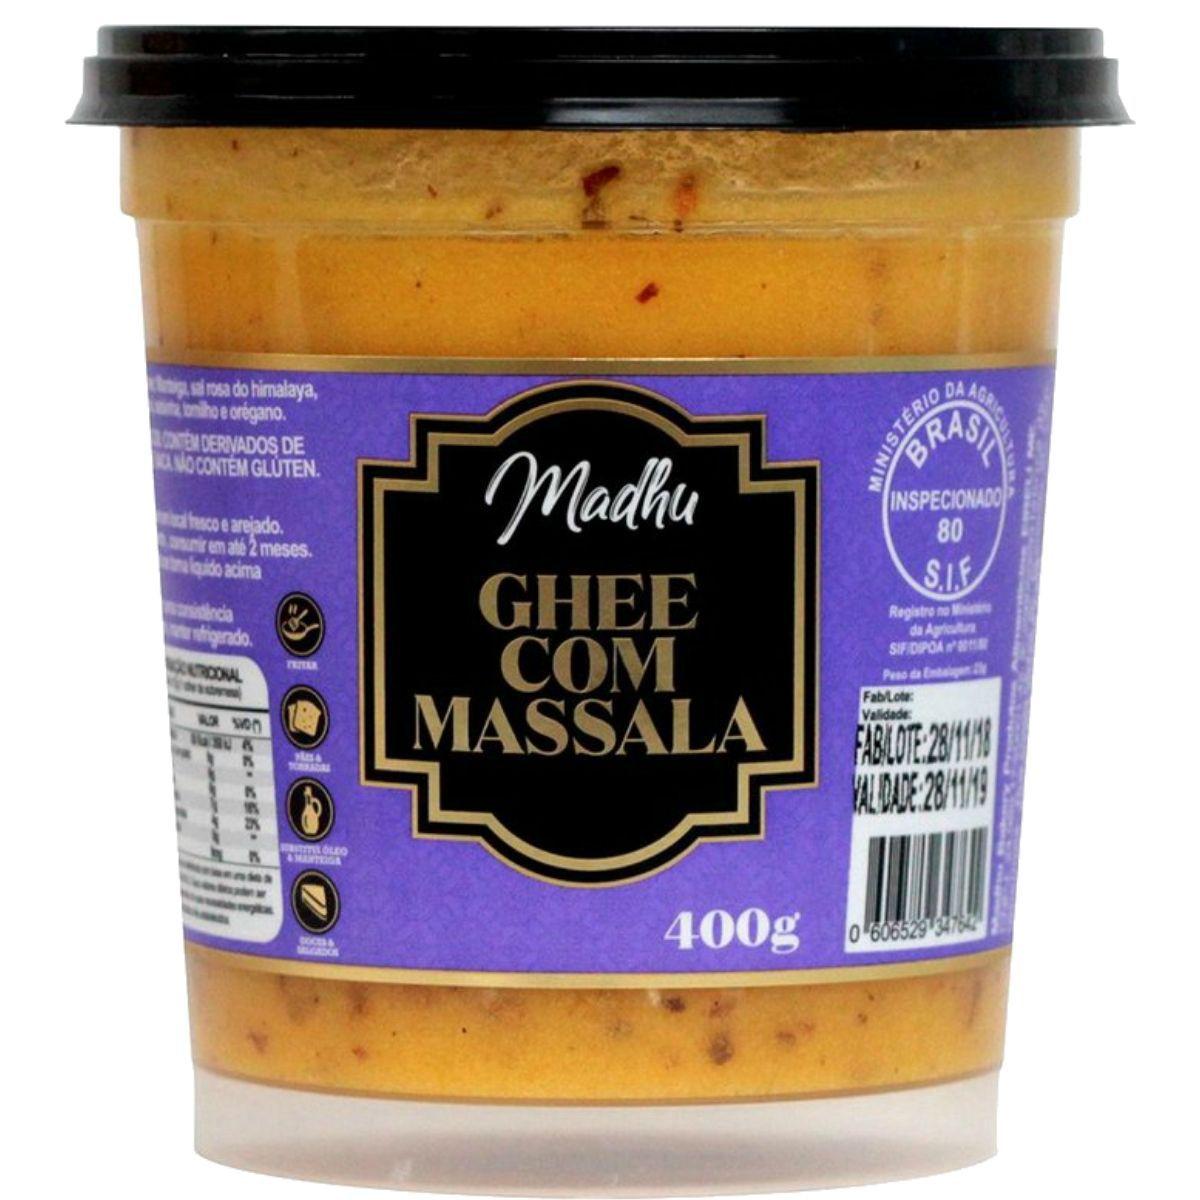 Manteiga Ghee C/ Massala Clarificada 400mg - Madhu Bakery